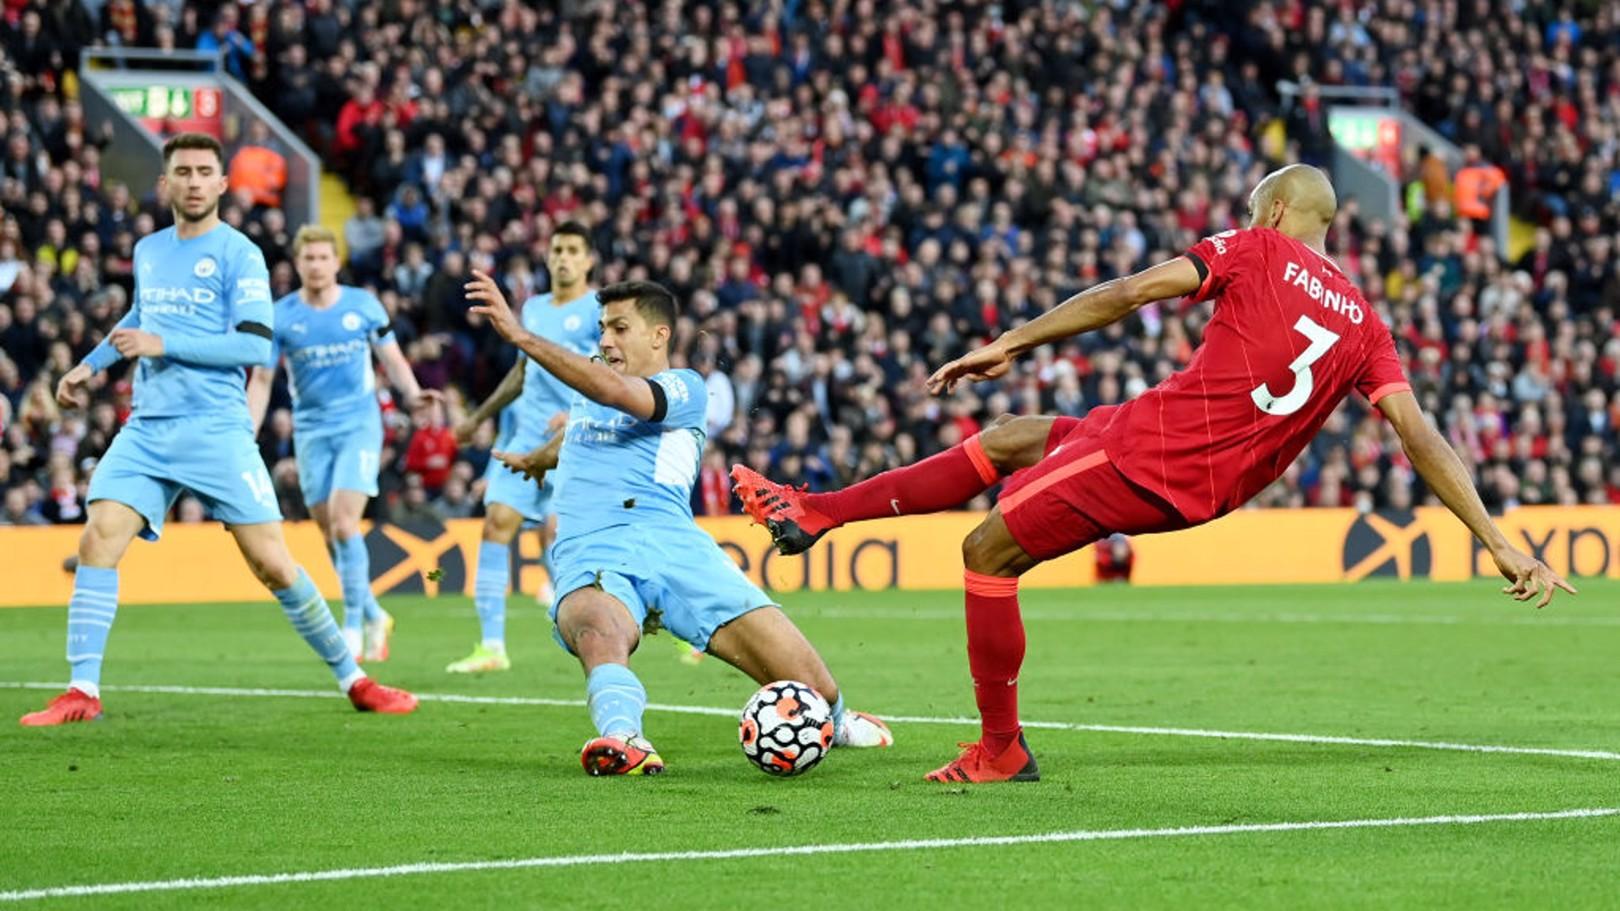 Lescott: Rodrigo's block could be the tackle of the season!